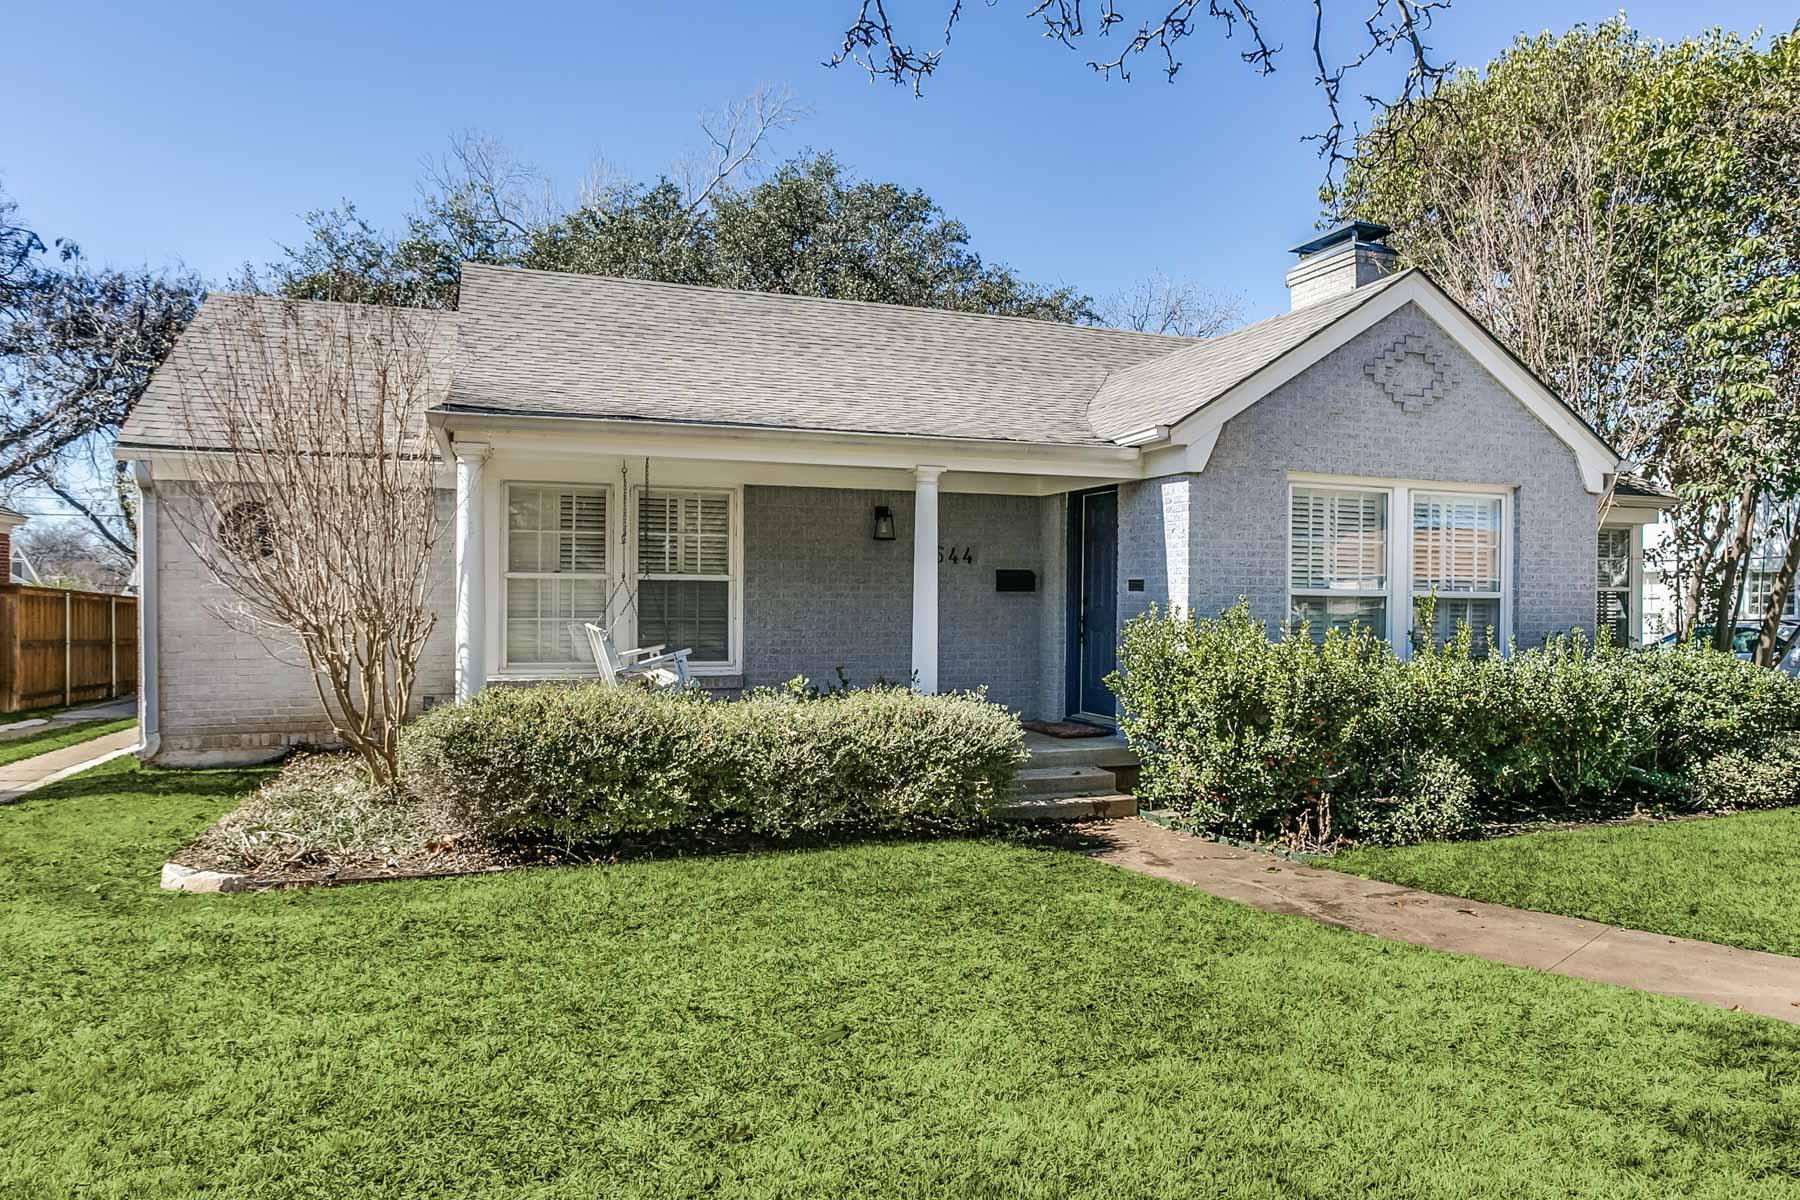 Villa per Vendita alle ore Charming Updated Traditional Near TCU 3544 Harwen Terr Fort Worth, Texas, 76109 Stati Uniti